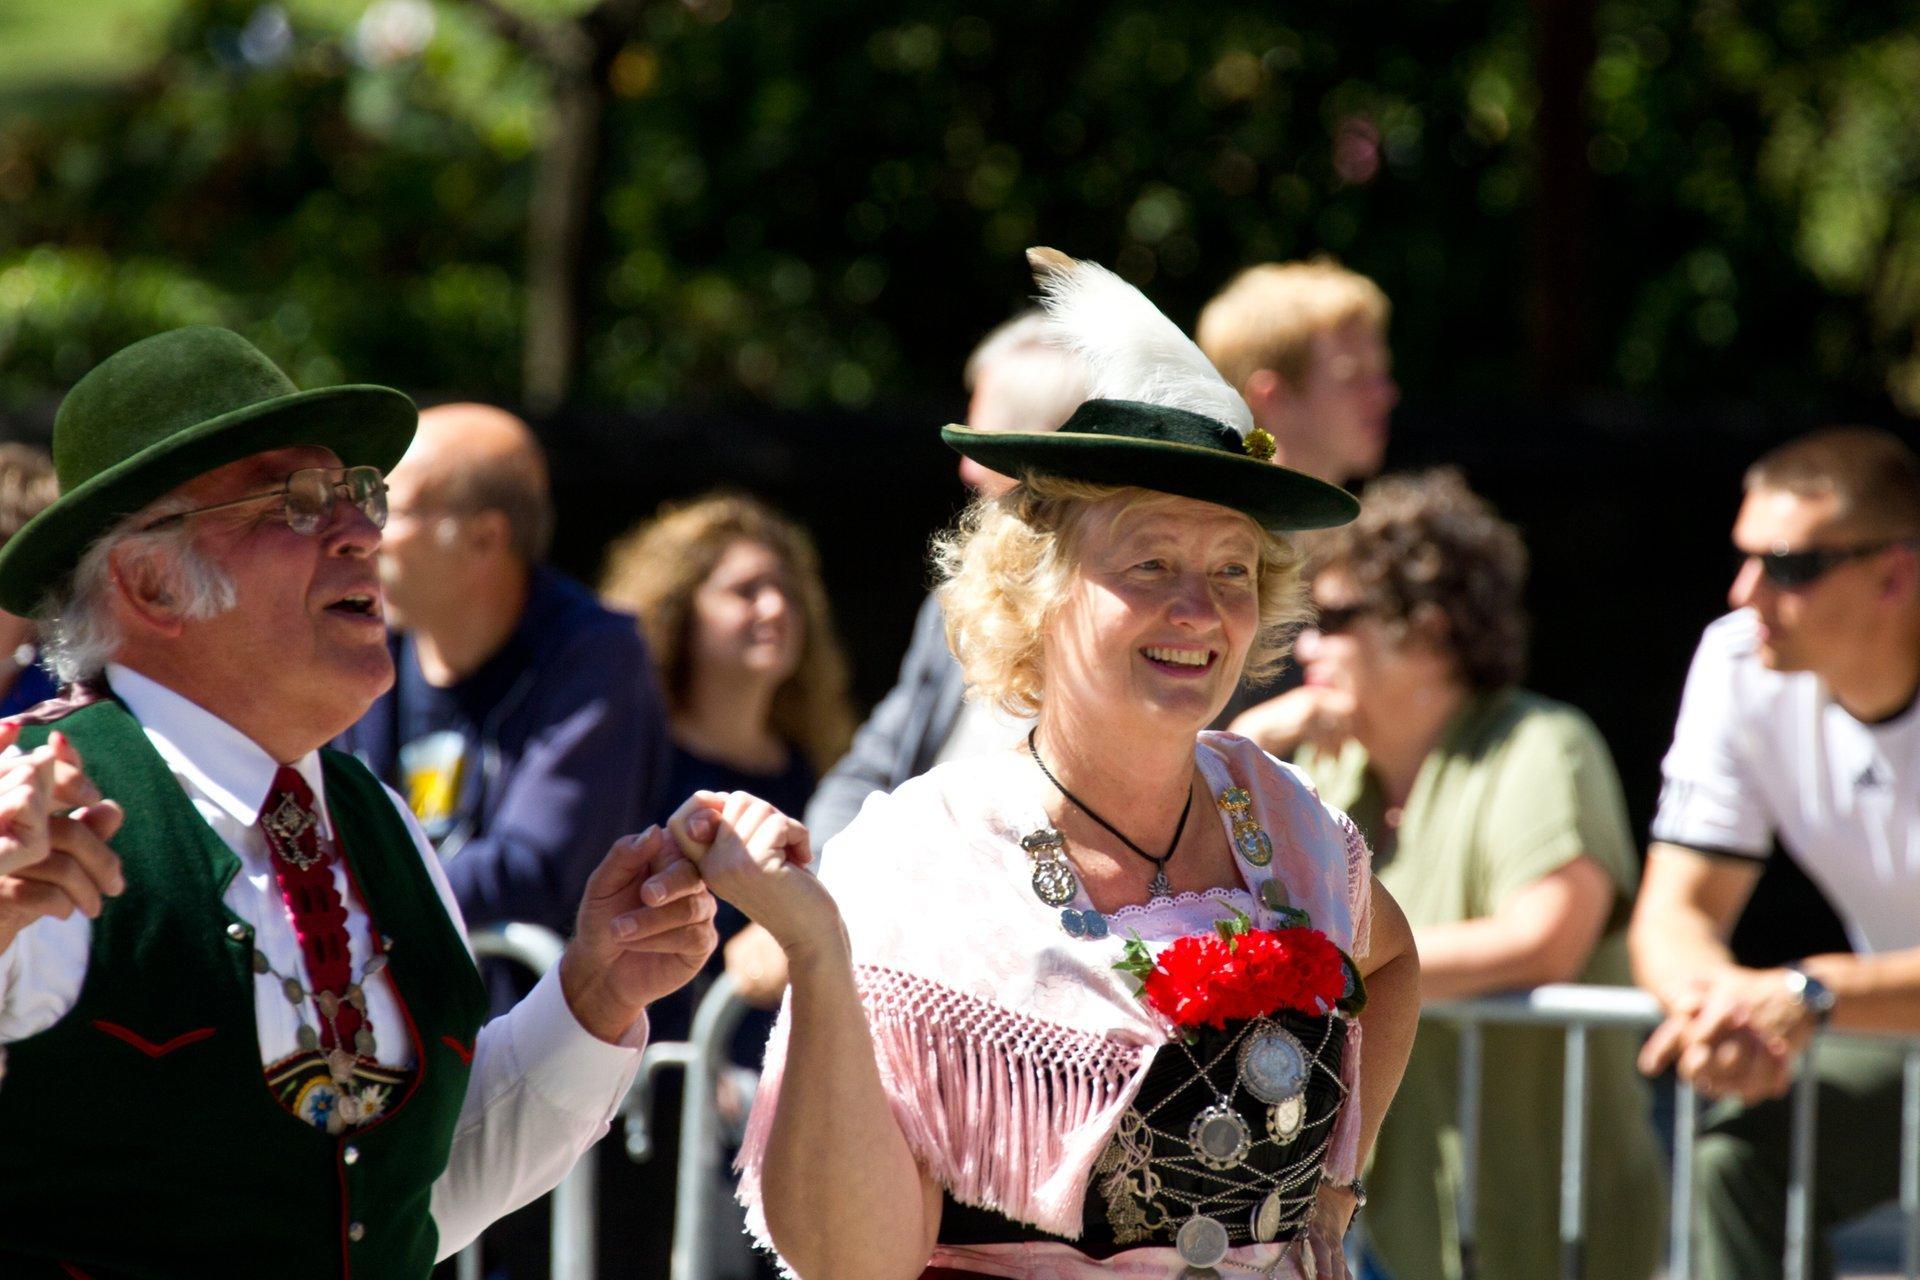 Herr und Frau at the German-American Steuben Parade 2020